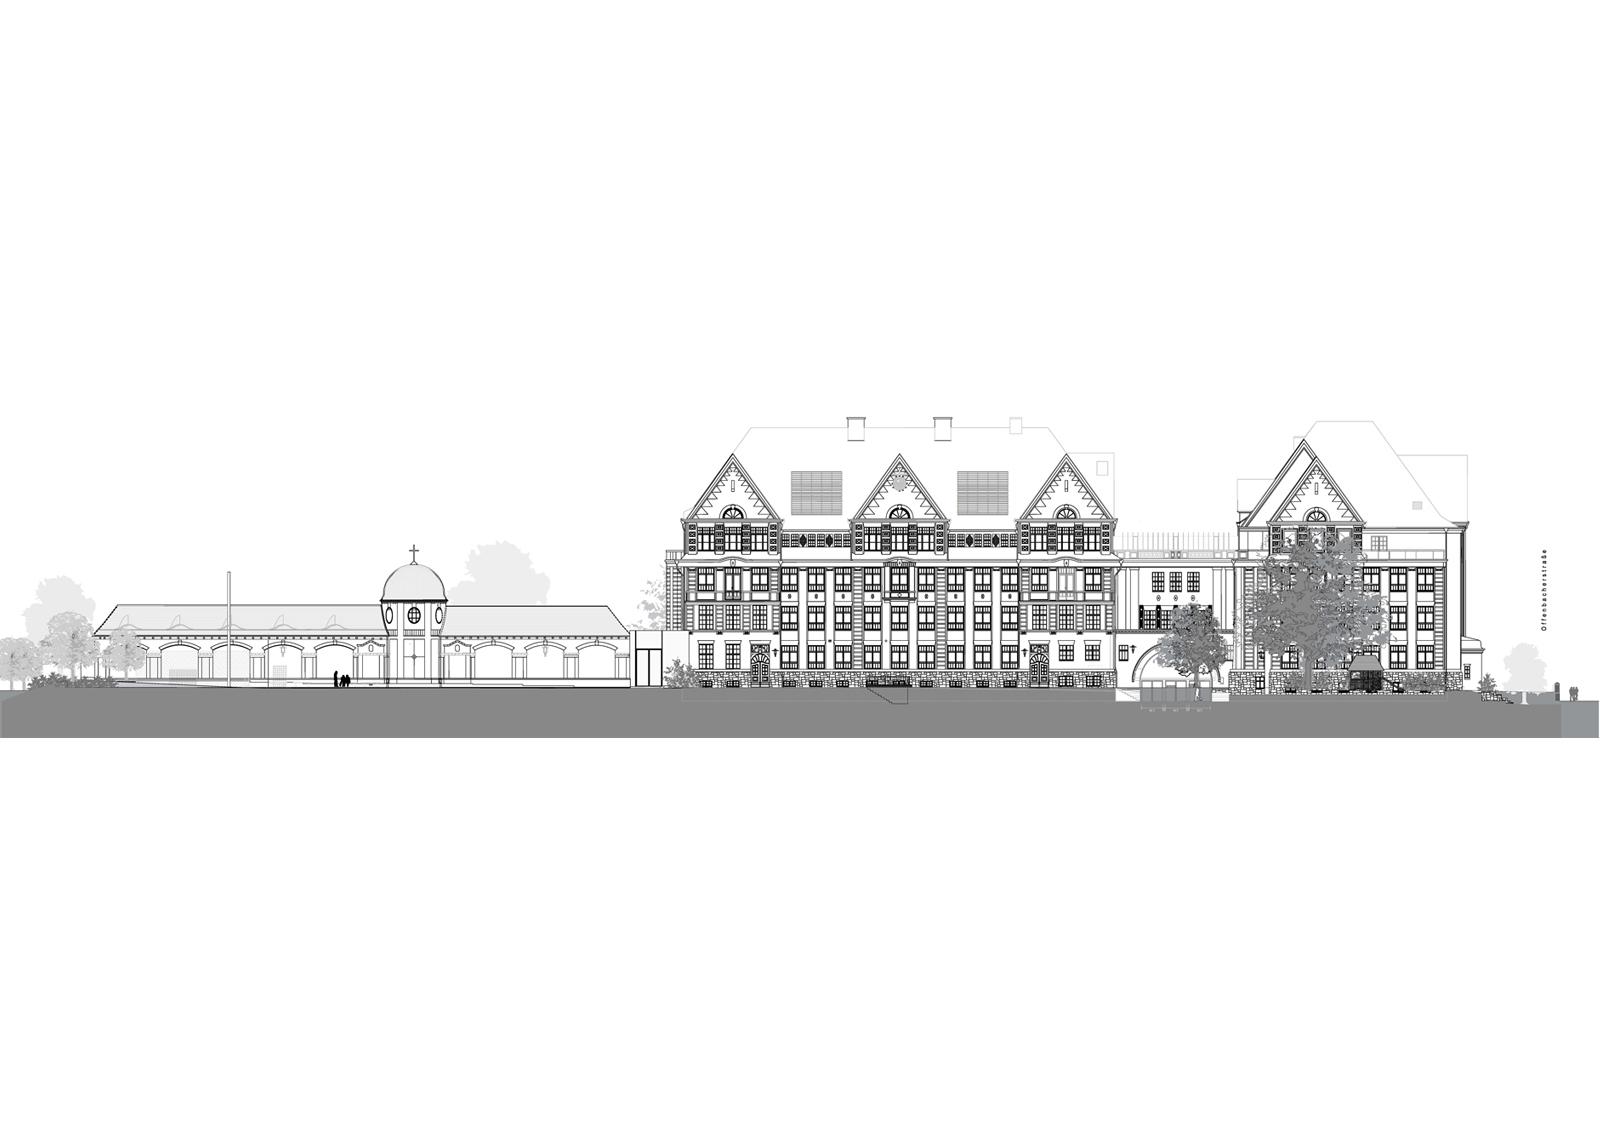 schnitt-ruppin-schule-aussenanlagen-grundschule-neuplanung-berlin-landschaftsarchitektur-albert-armbruster